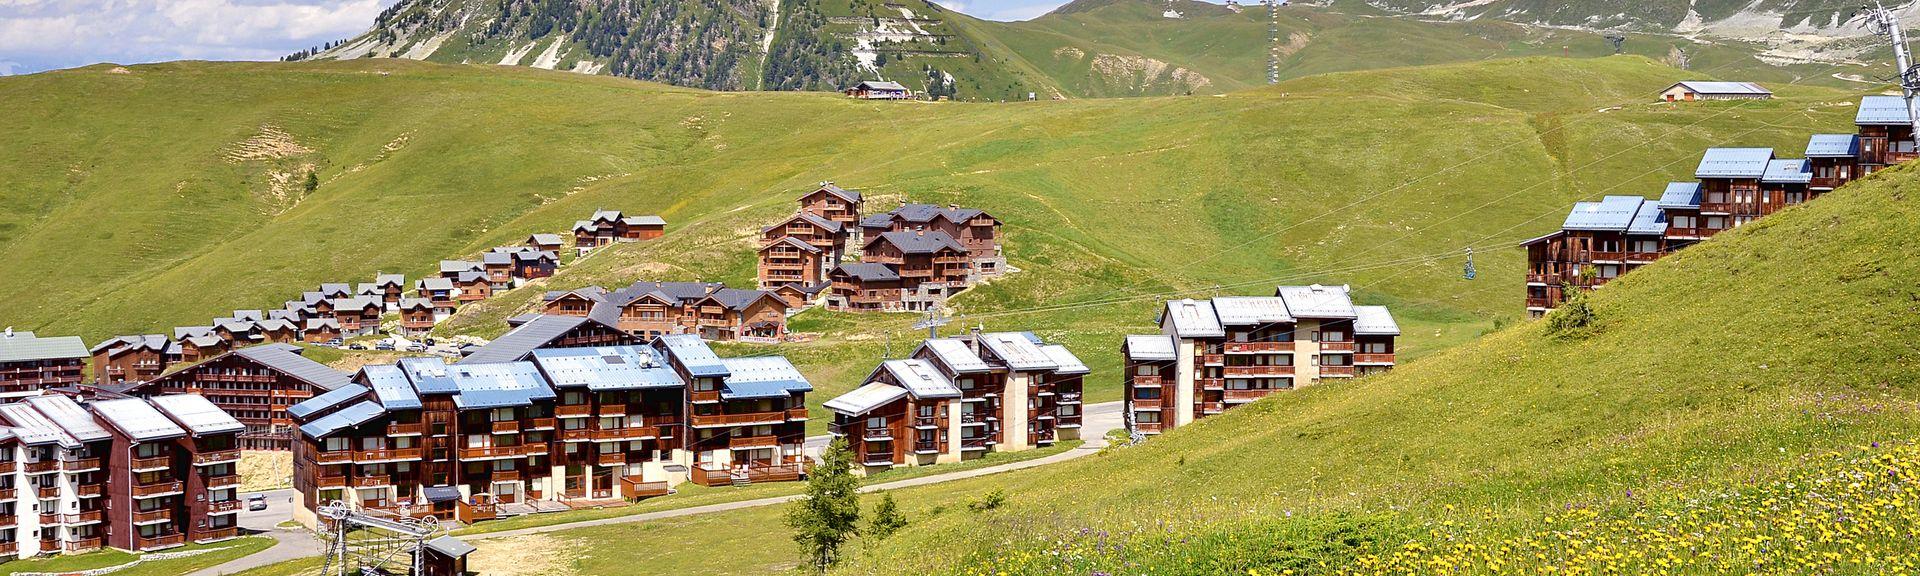 Savoie, Auvergne Rhône-Alpes, Frankrig